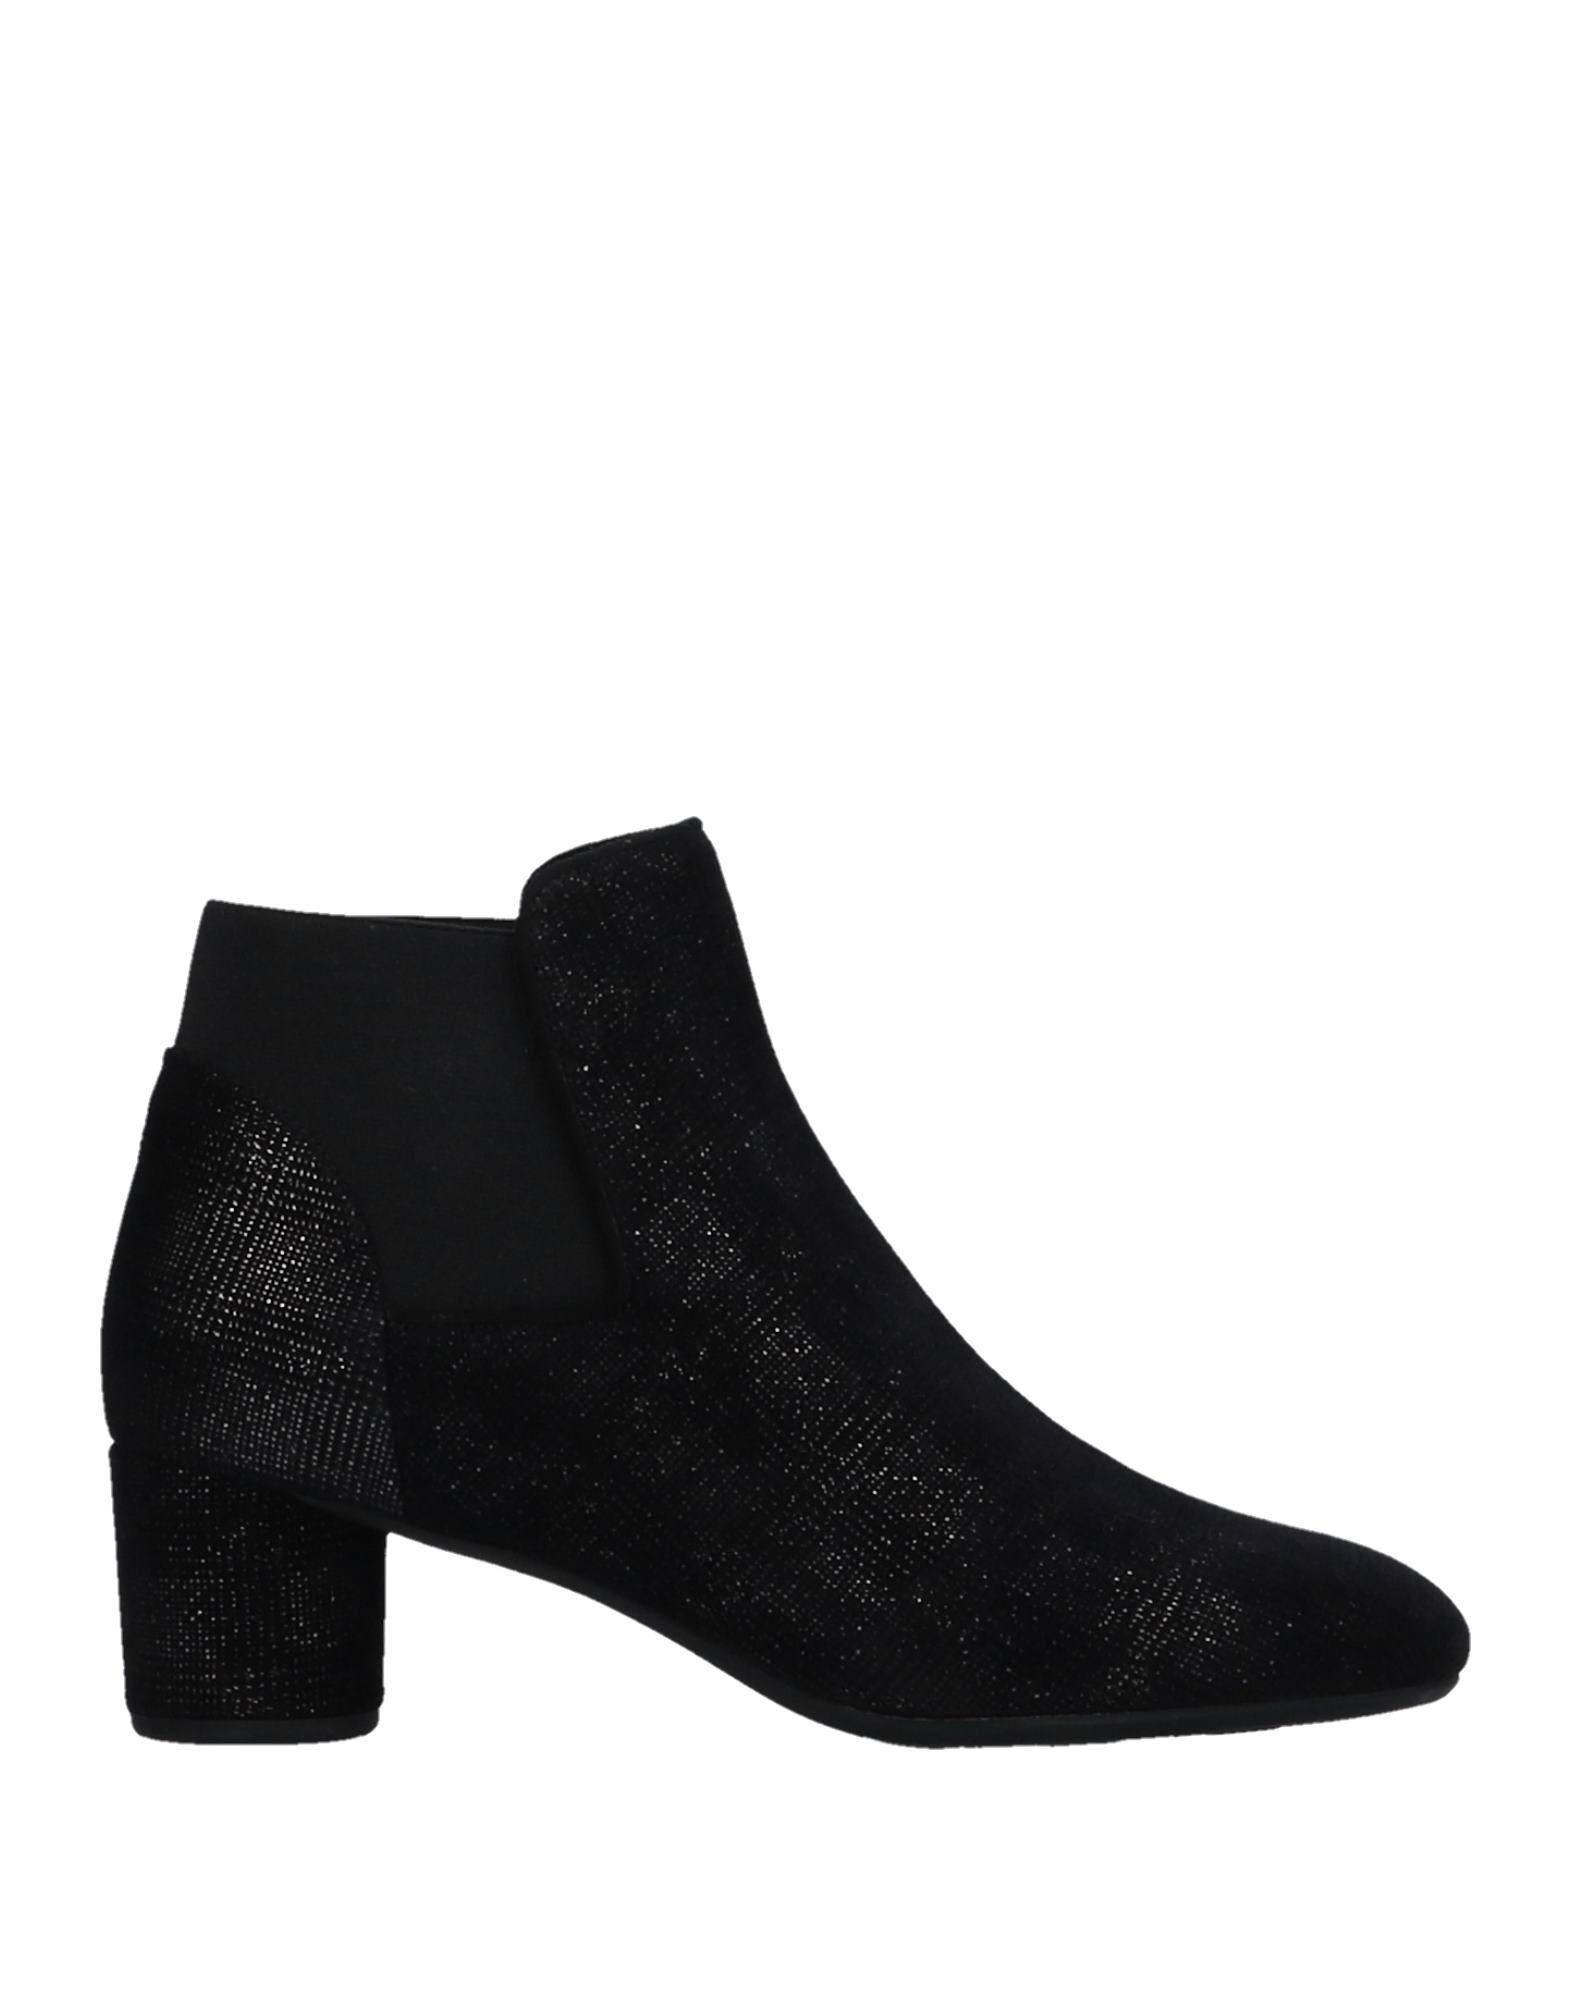 Stilvolle billige Schuhe Damen Pas De Rouge Stiefelette Damen Schuhe  11510804MG b880df